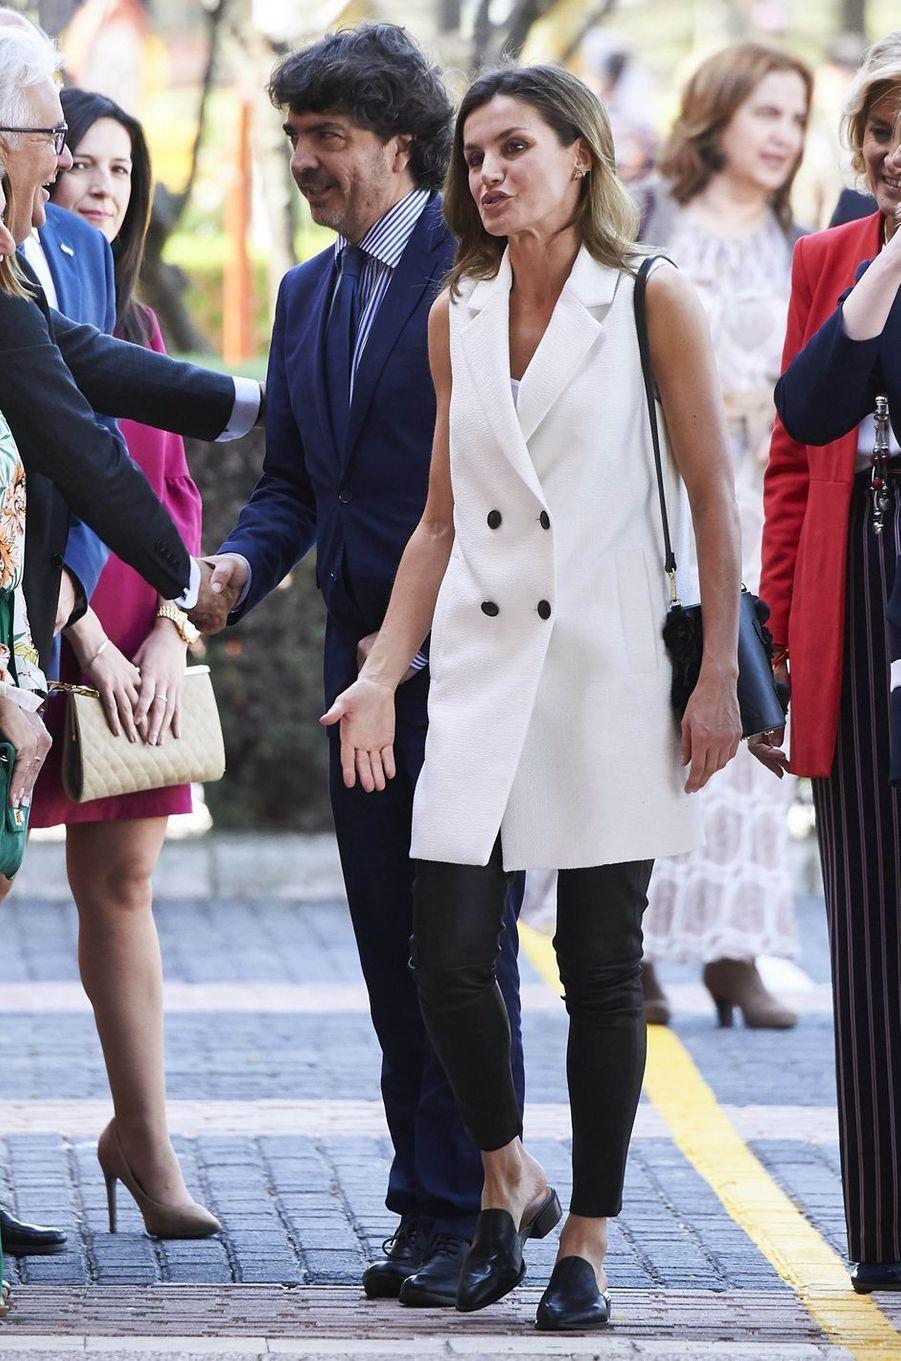 La reine Letizia d'Espagne à Villanueva de la Serena, le 26 avril 2018